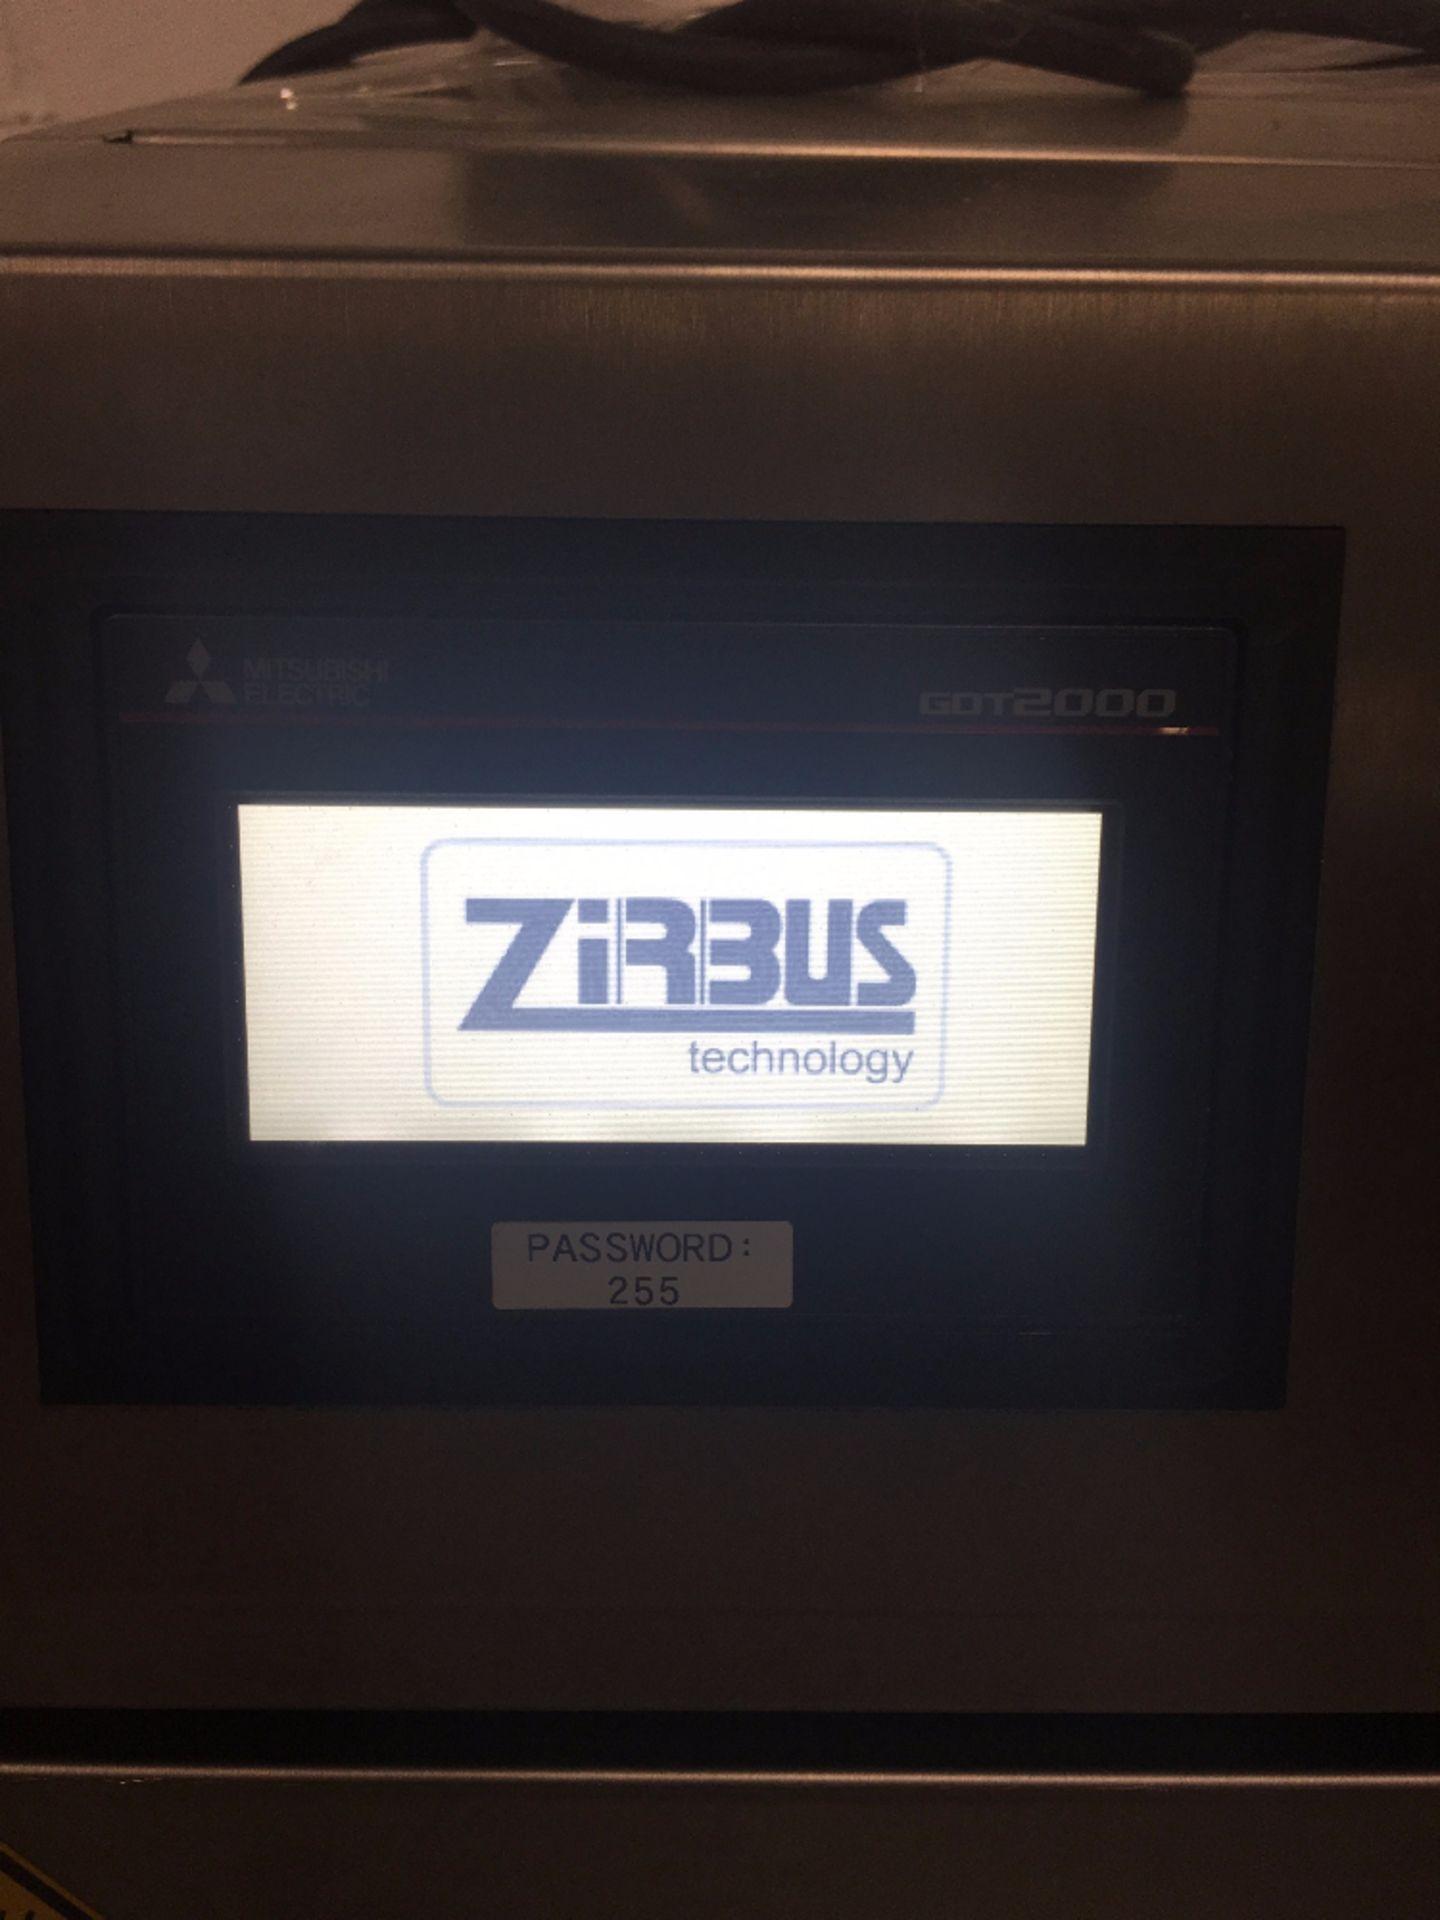 ZirBus LTA 2x3x4 Laboratory Tabletop Autoclave - Image 2 of 4